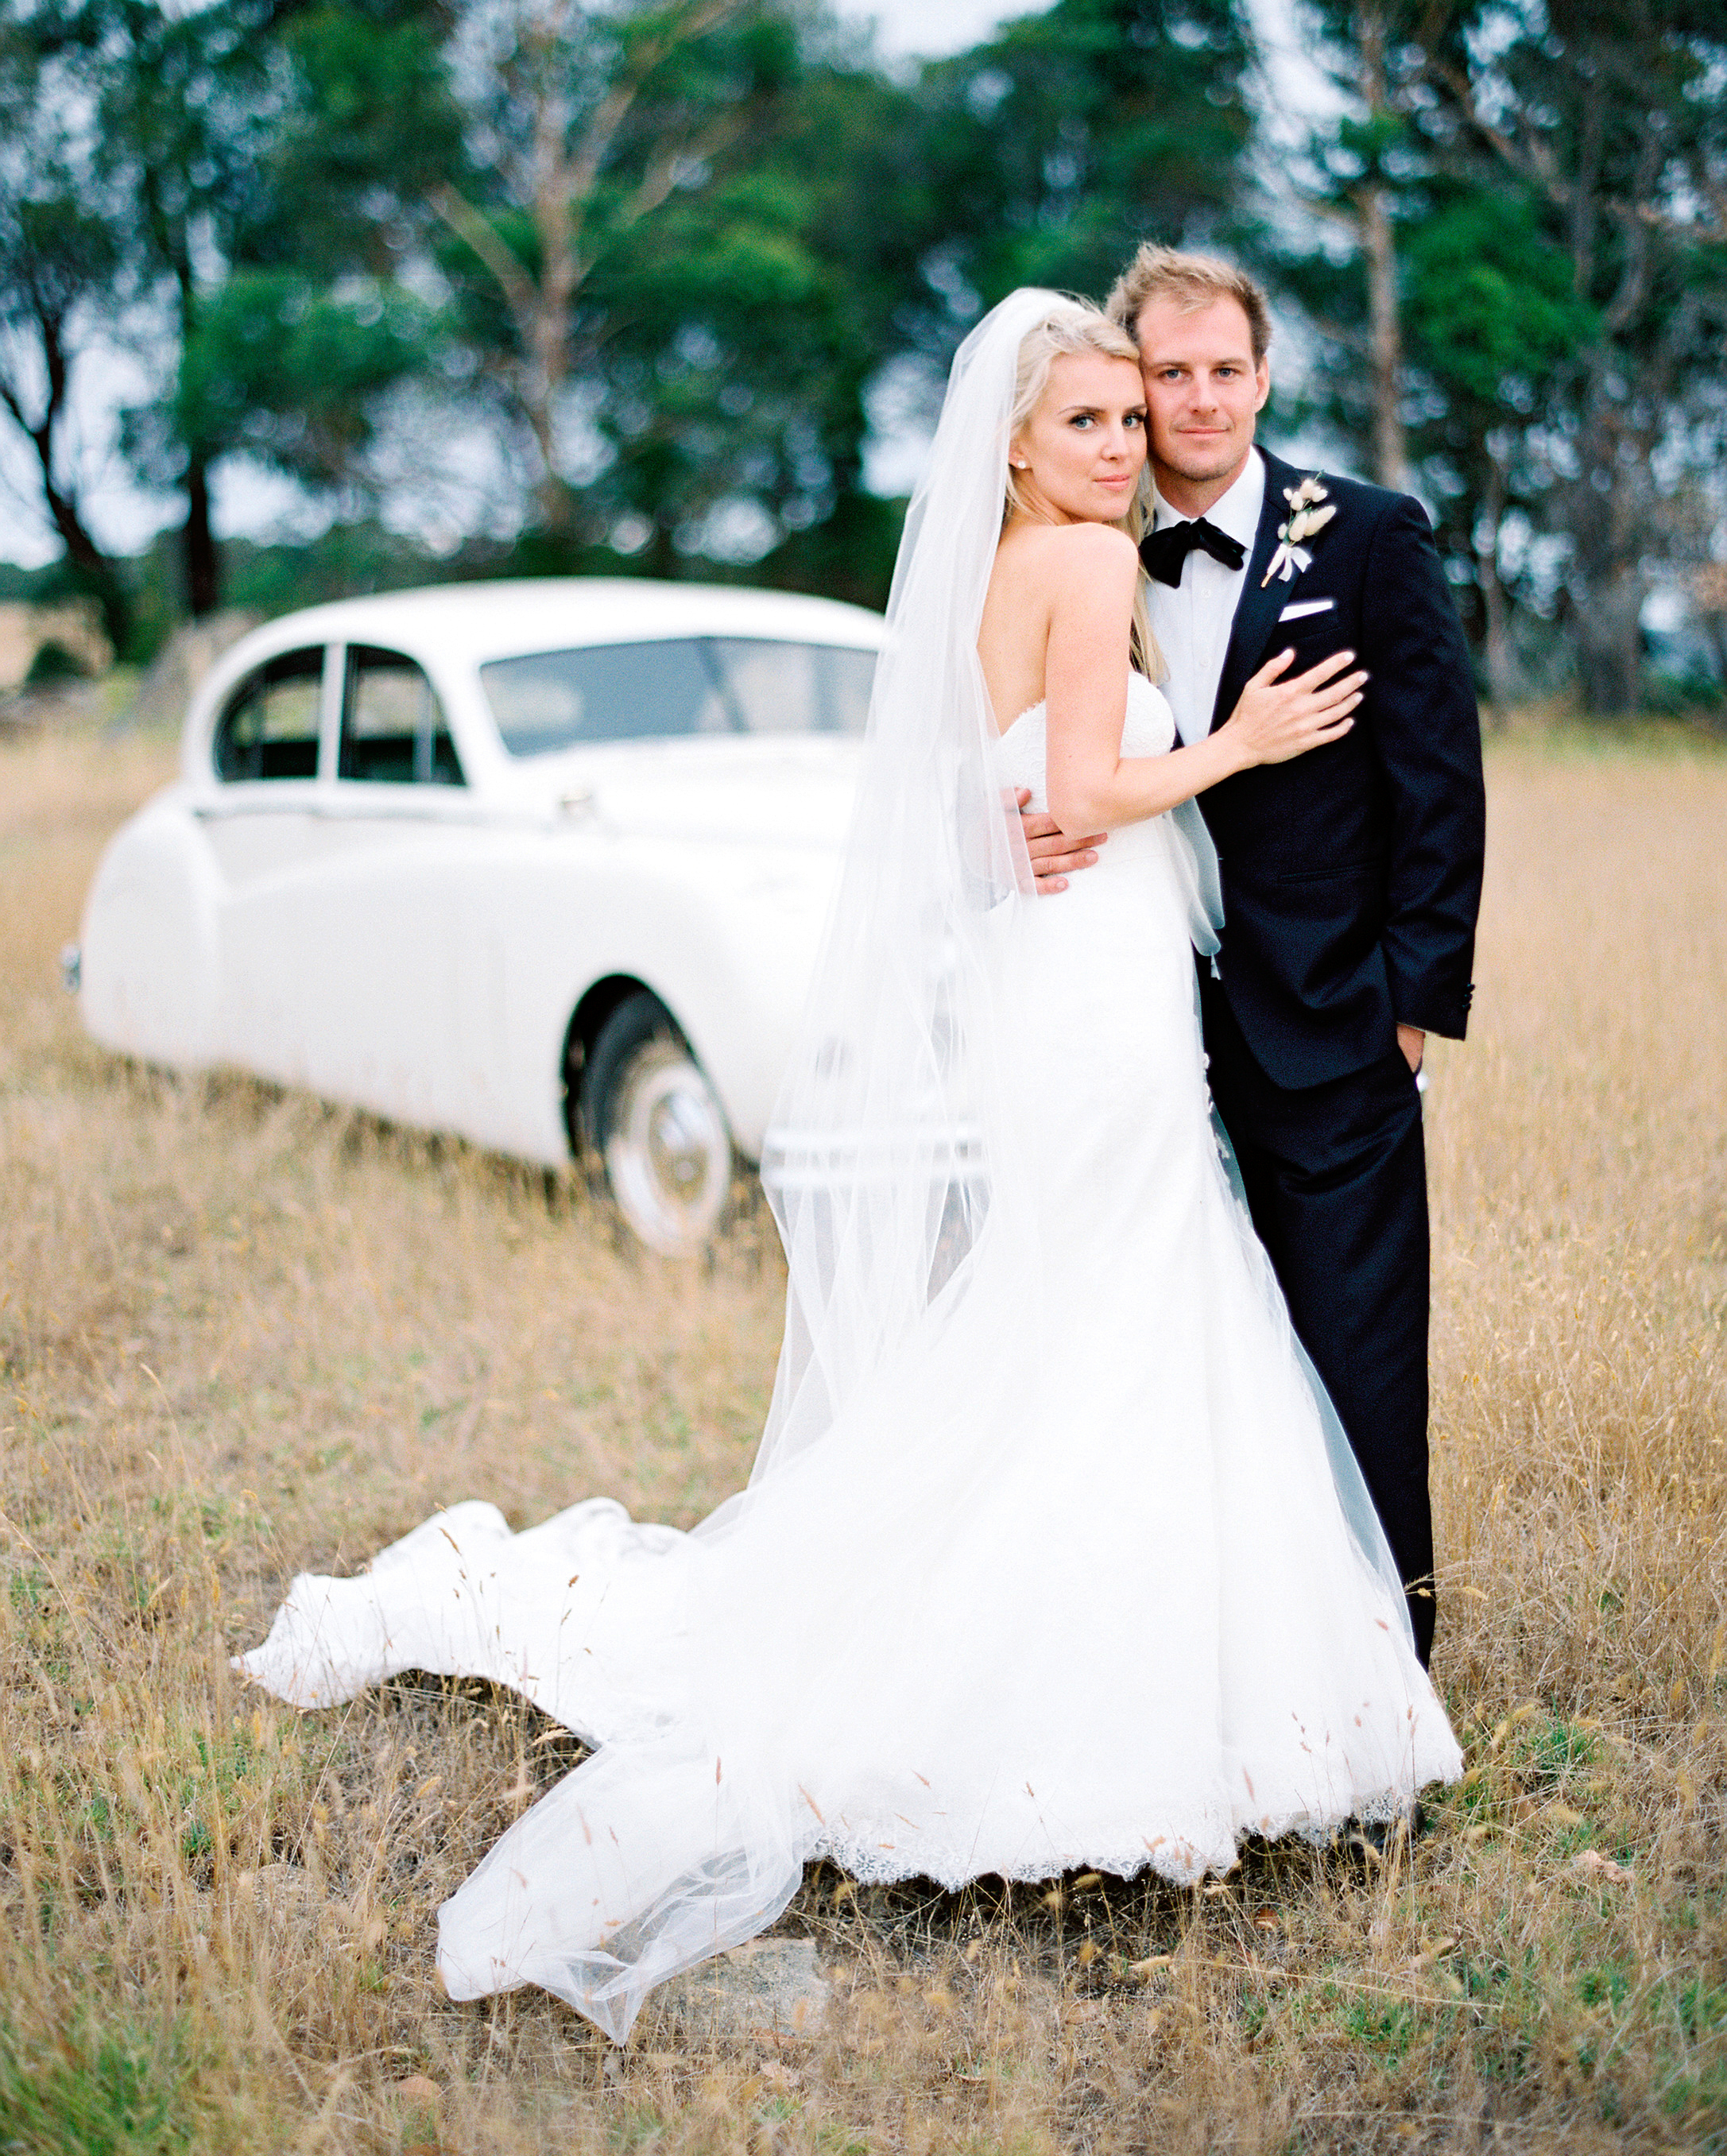 jemma-michael-wedding-couple-002567007-s112110-0815.jpg